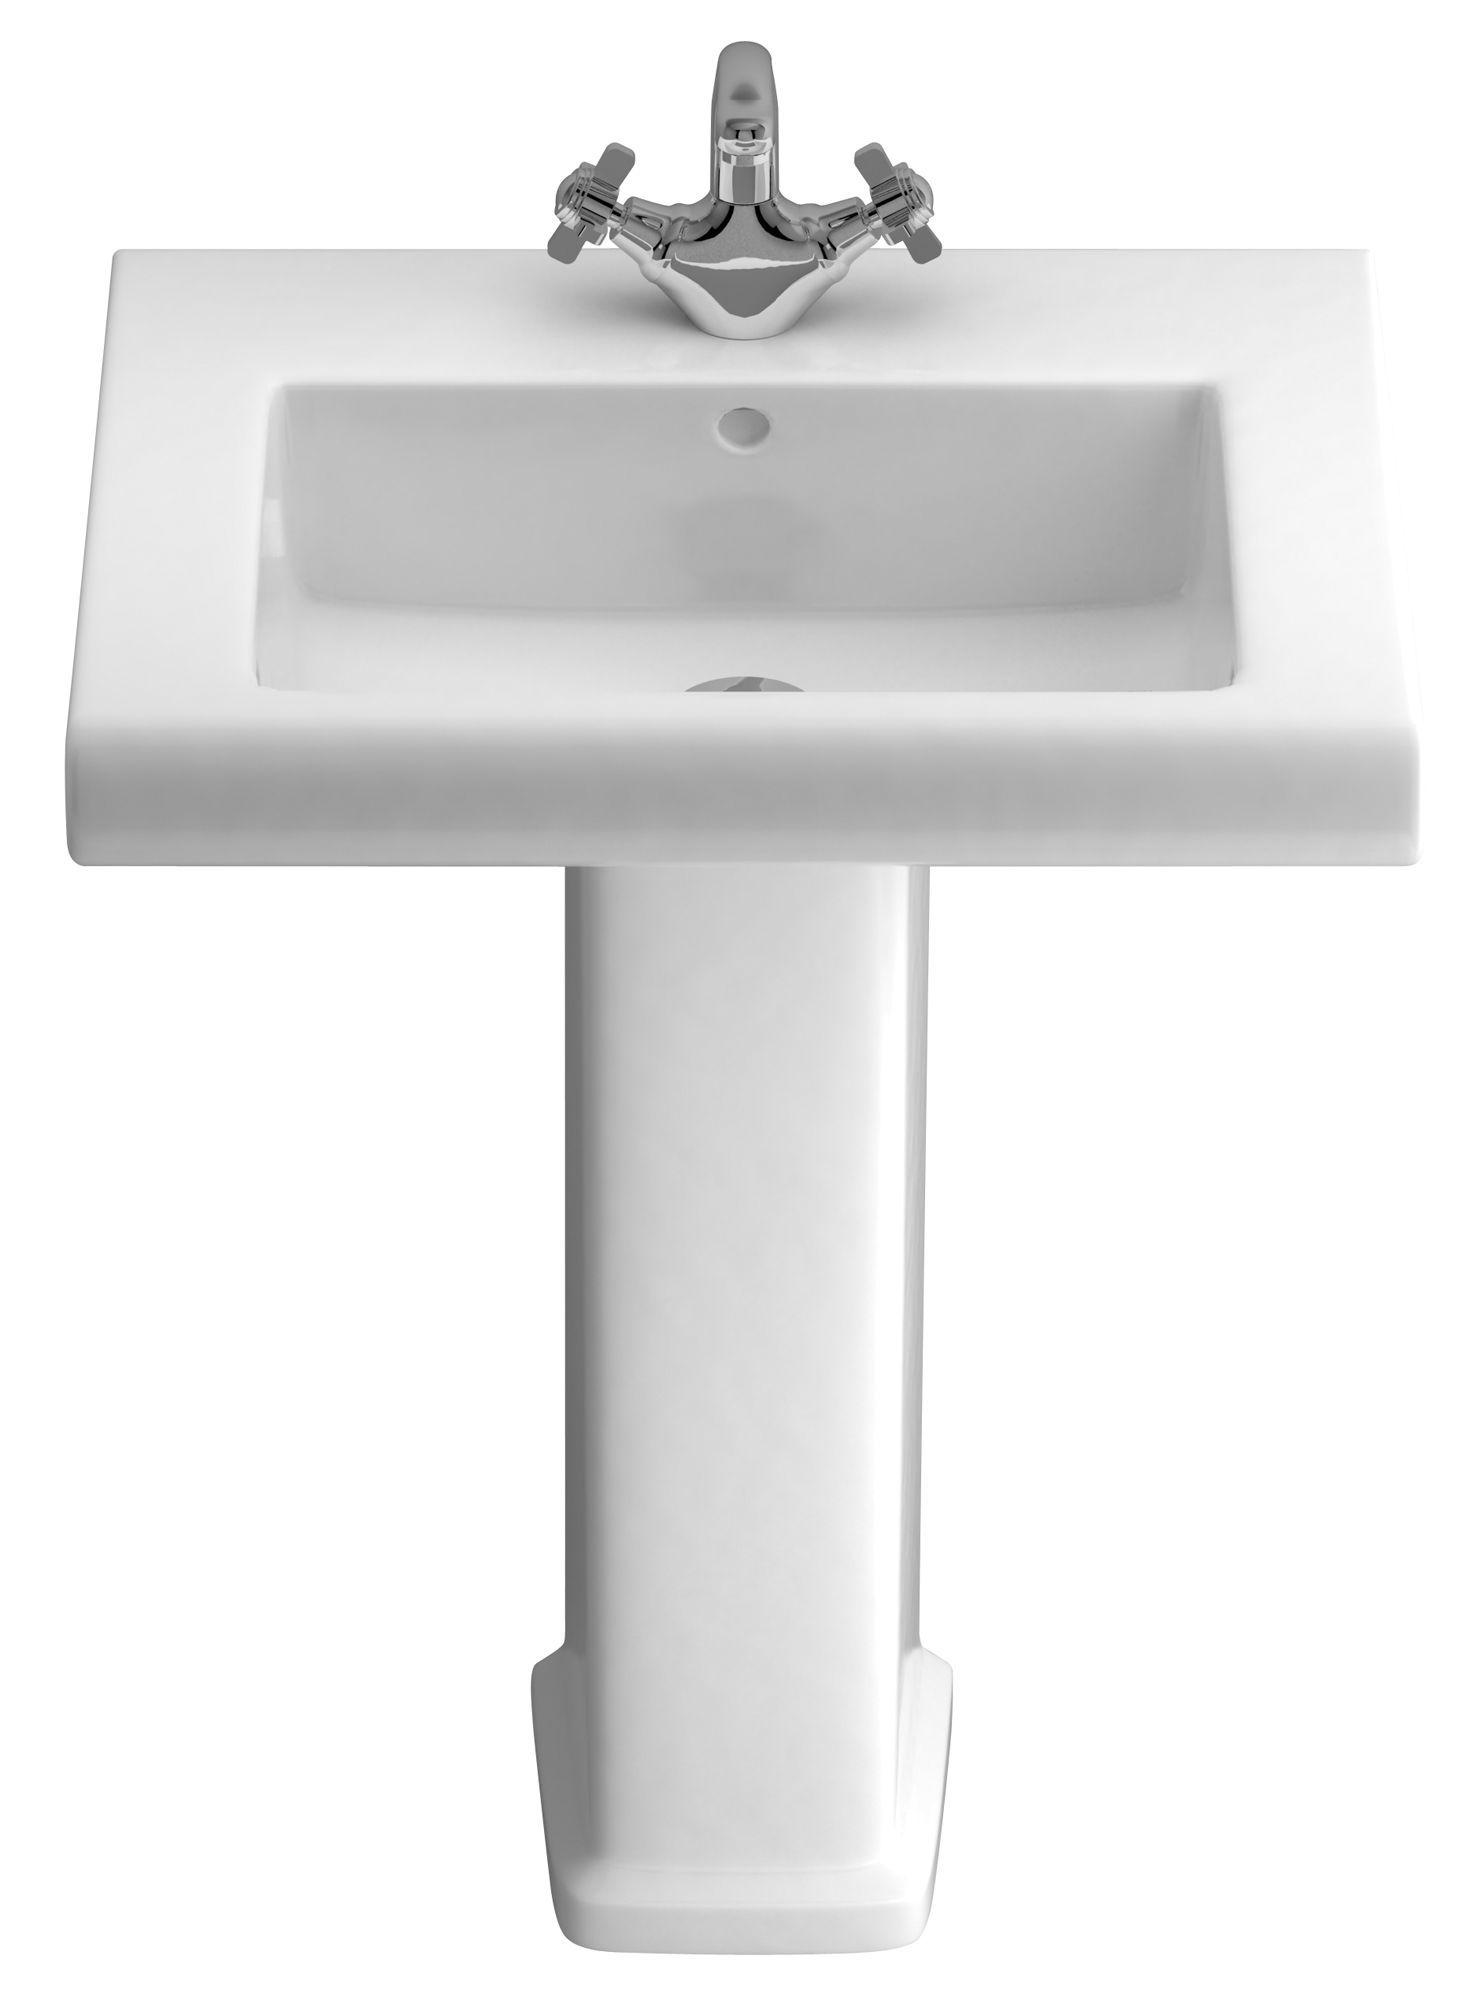 Bathroom Sinks B&Q Ireland cooke & lewis somerville full pedestal basin | departments | diy